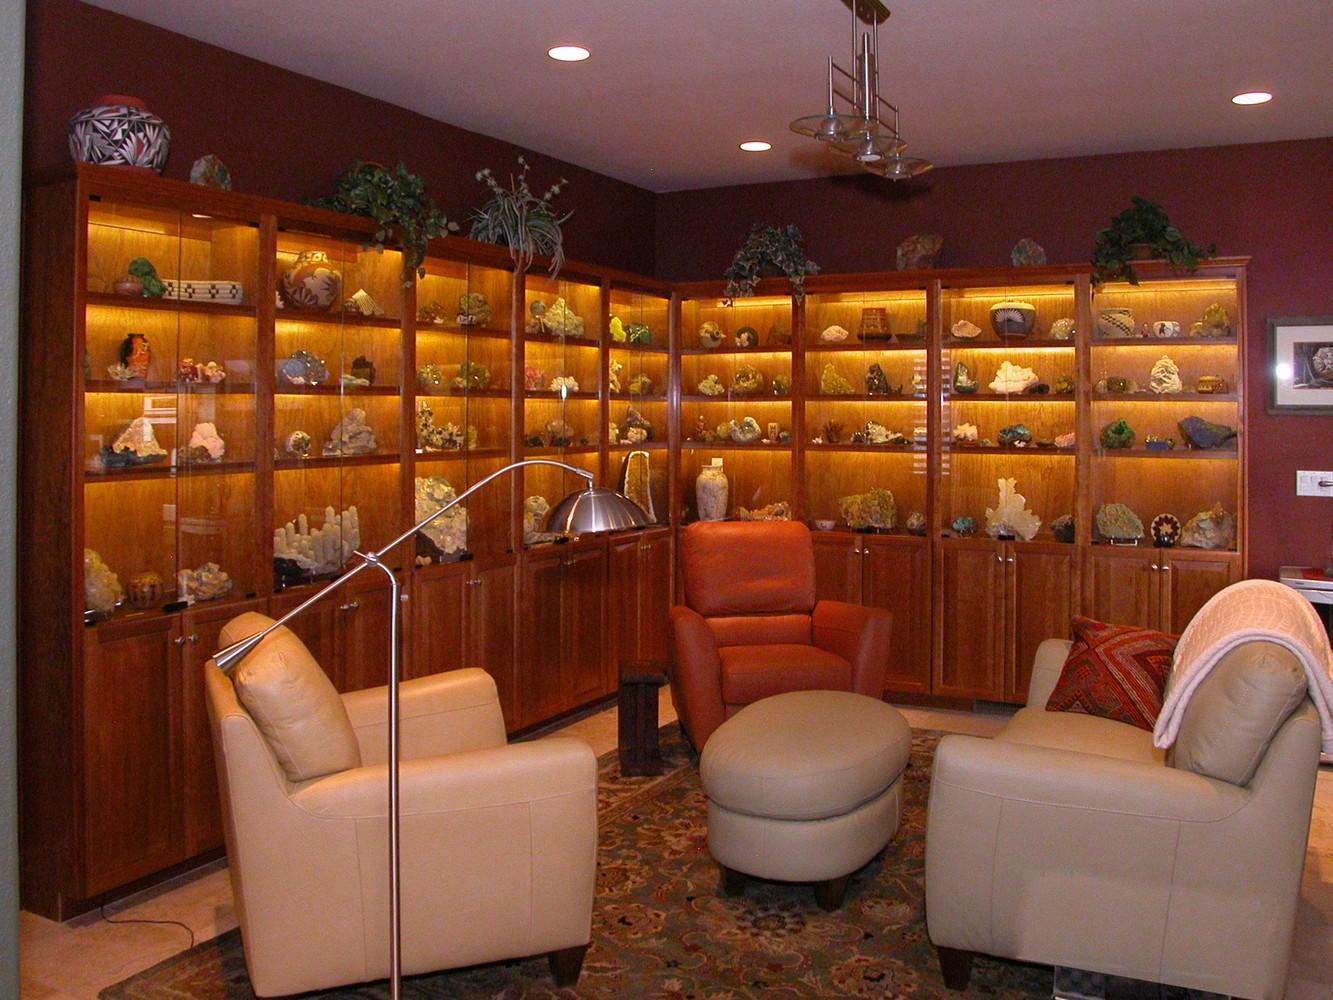 LED Illuminated Interiors In This Cherry Wood Geo Specimen Display Cabinet